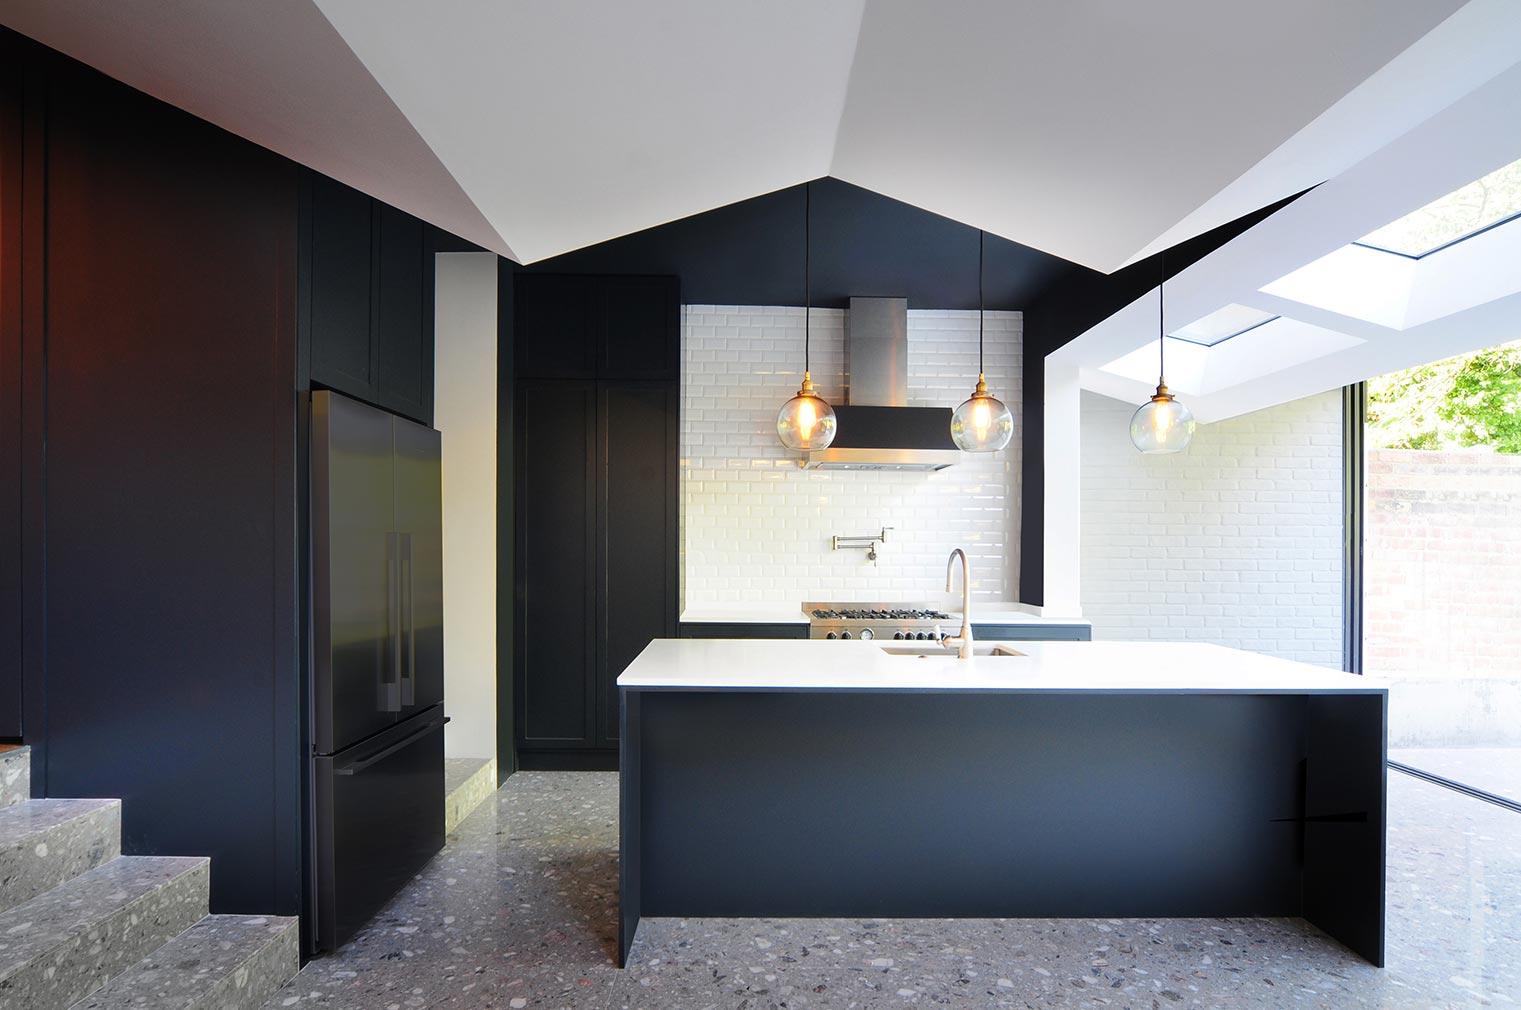 Folds House by Bureau de Change